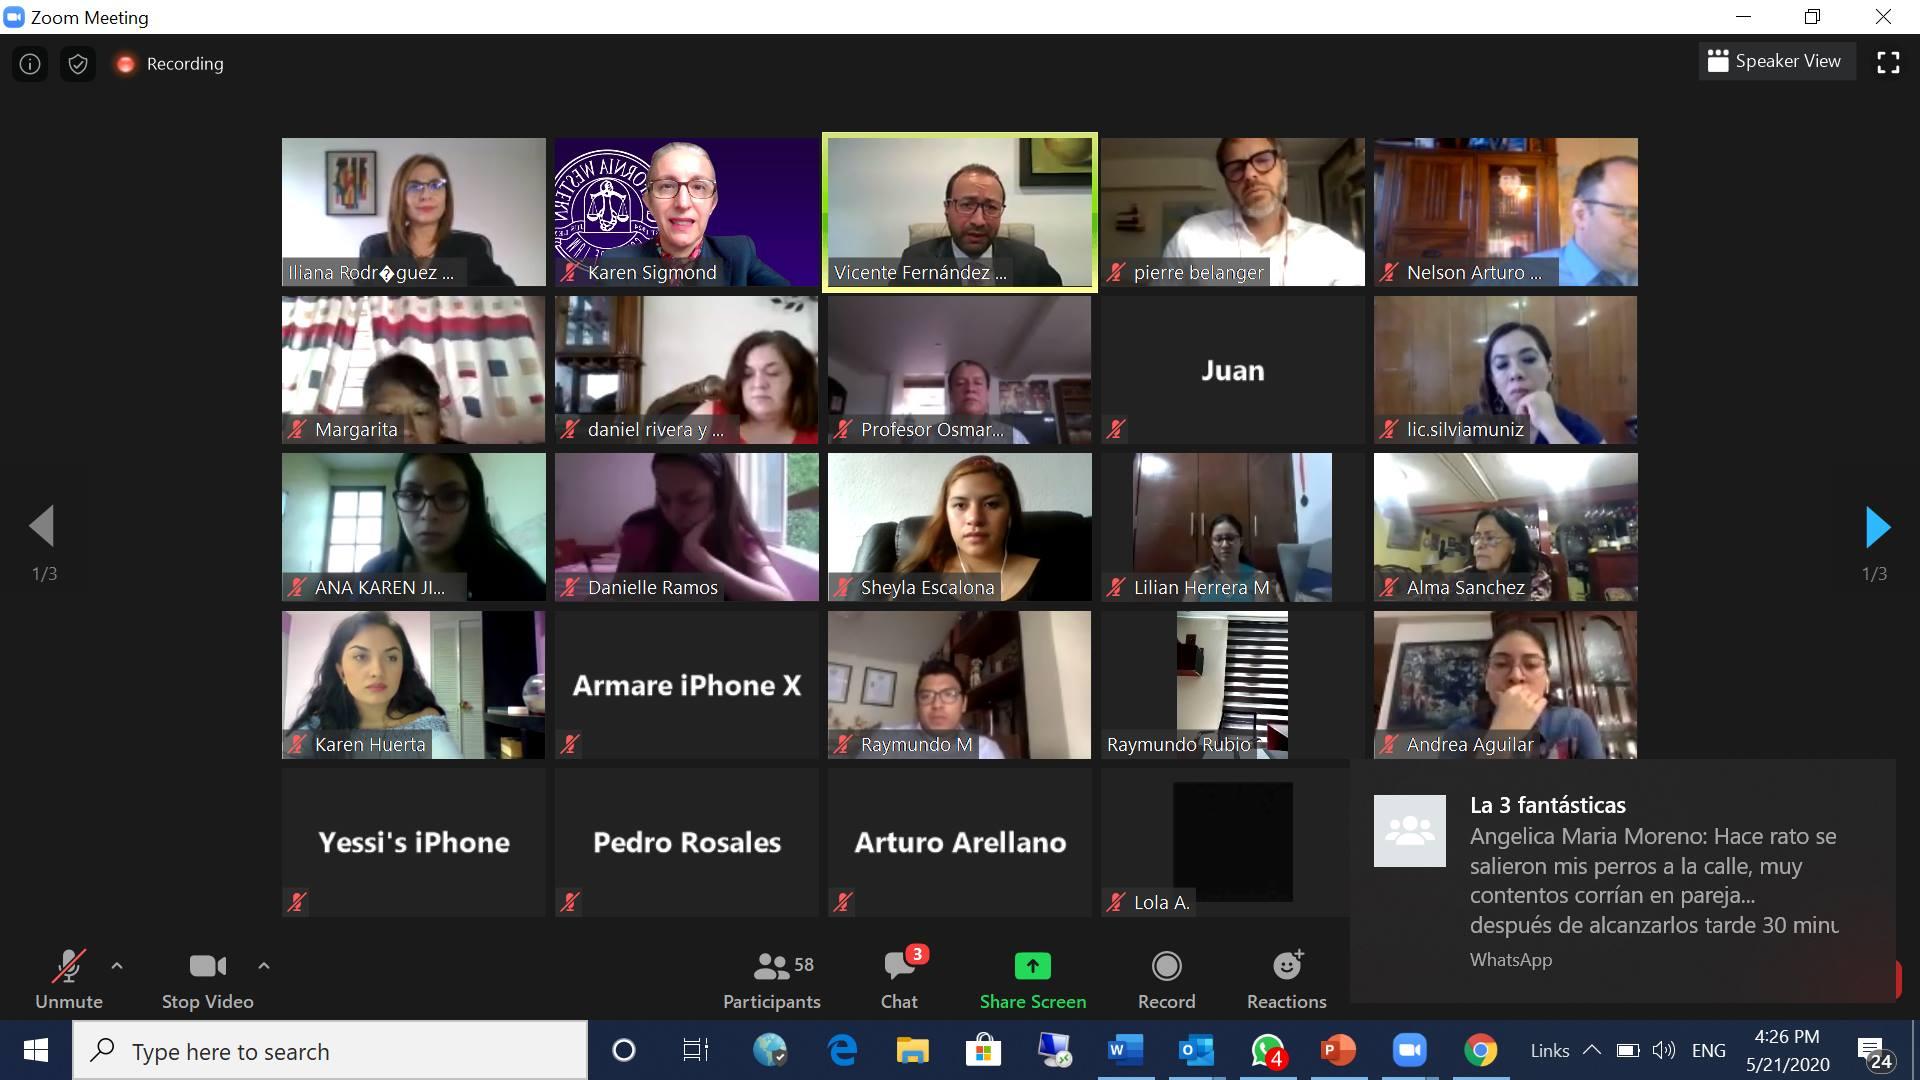 HRREC Members Pierre-Gilles Bélanger & Nelson Arturo Ovalle Diaz in a Virtual Panel